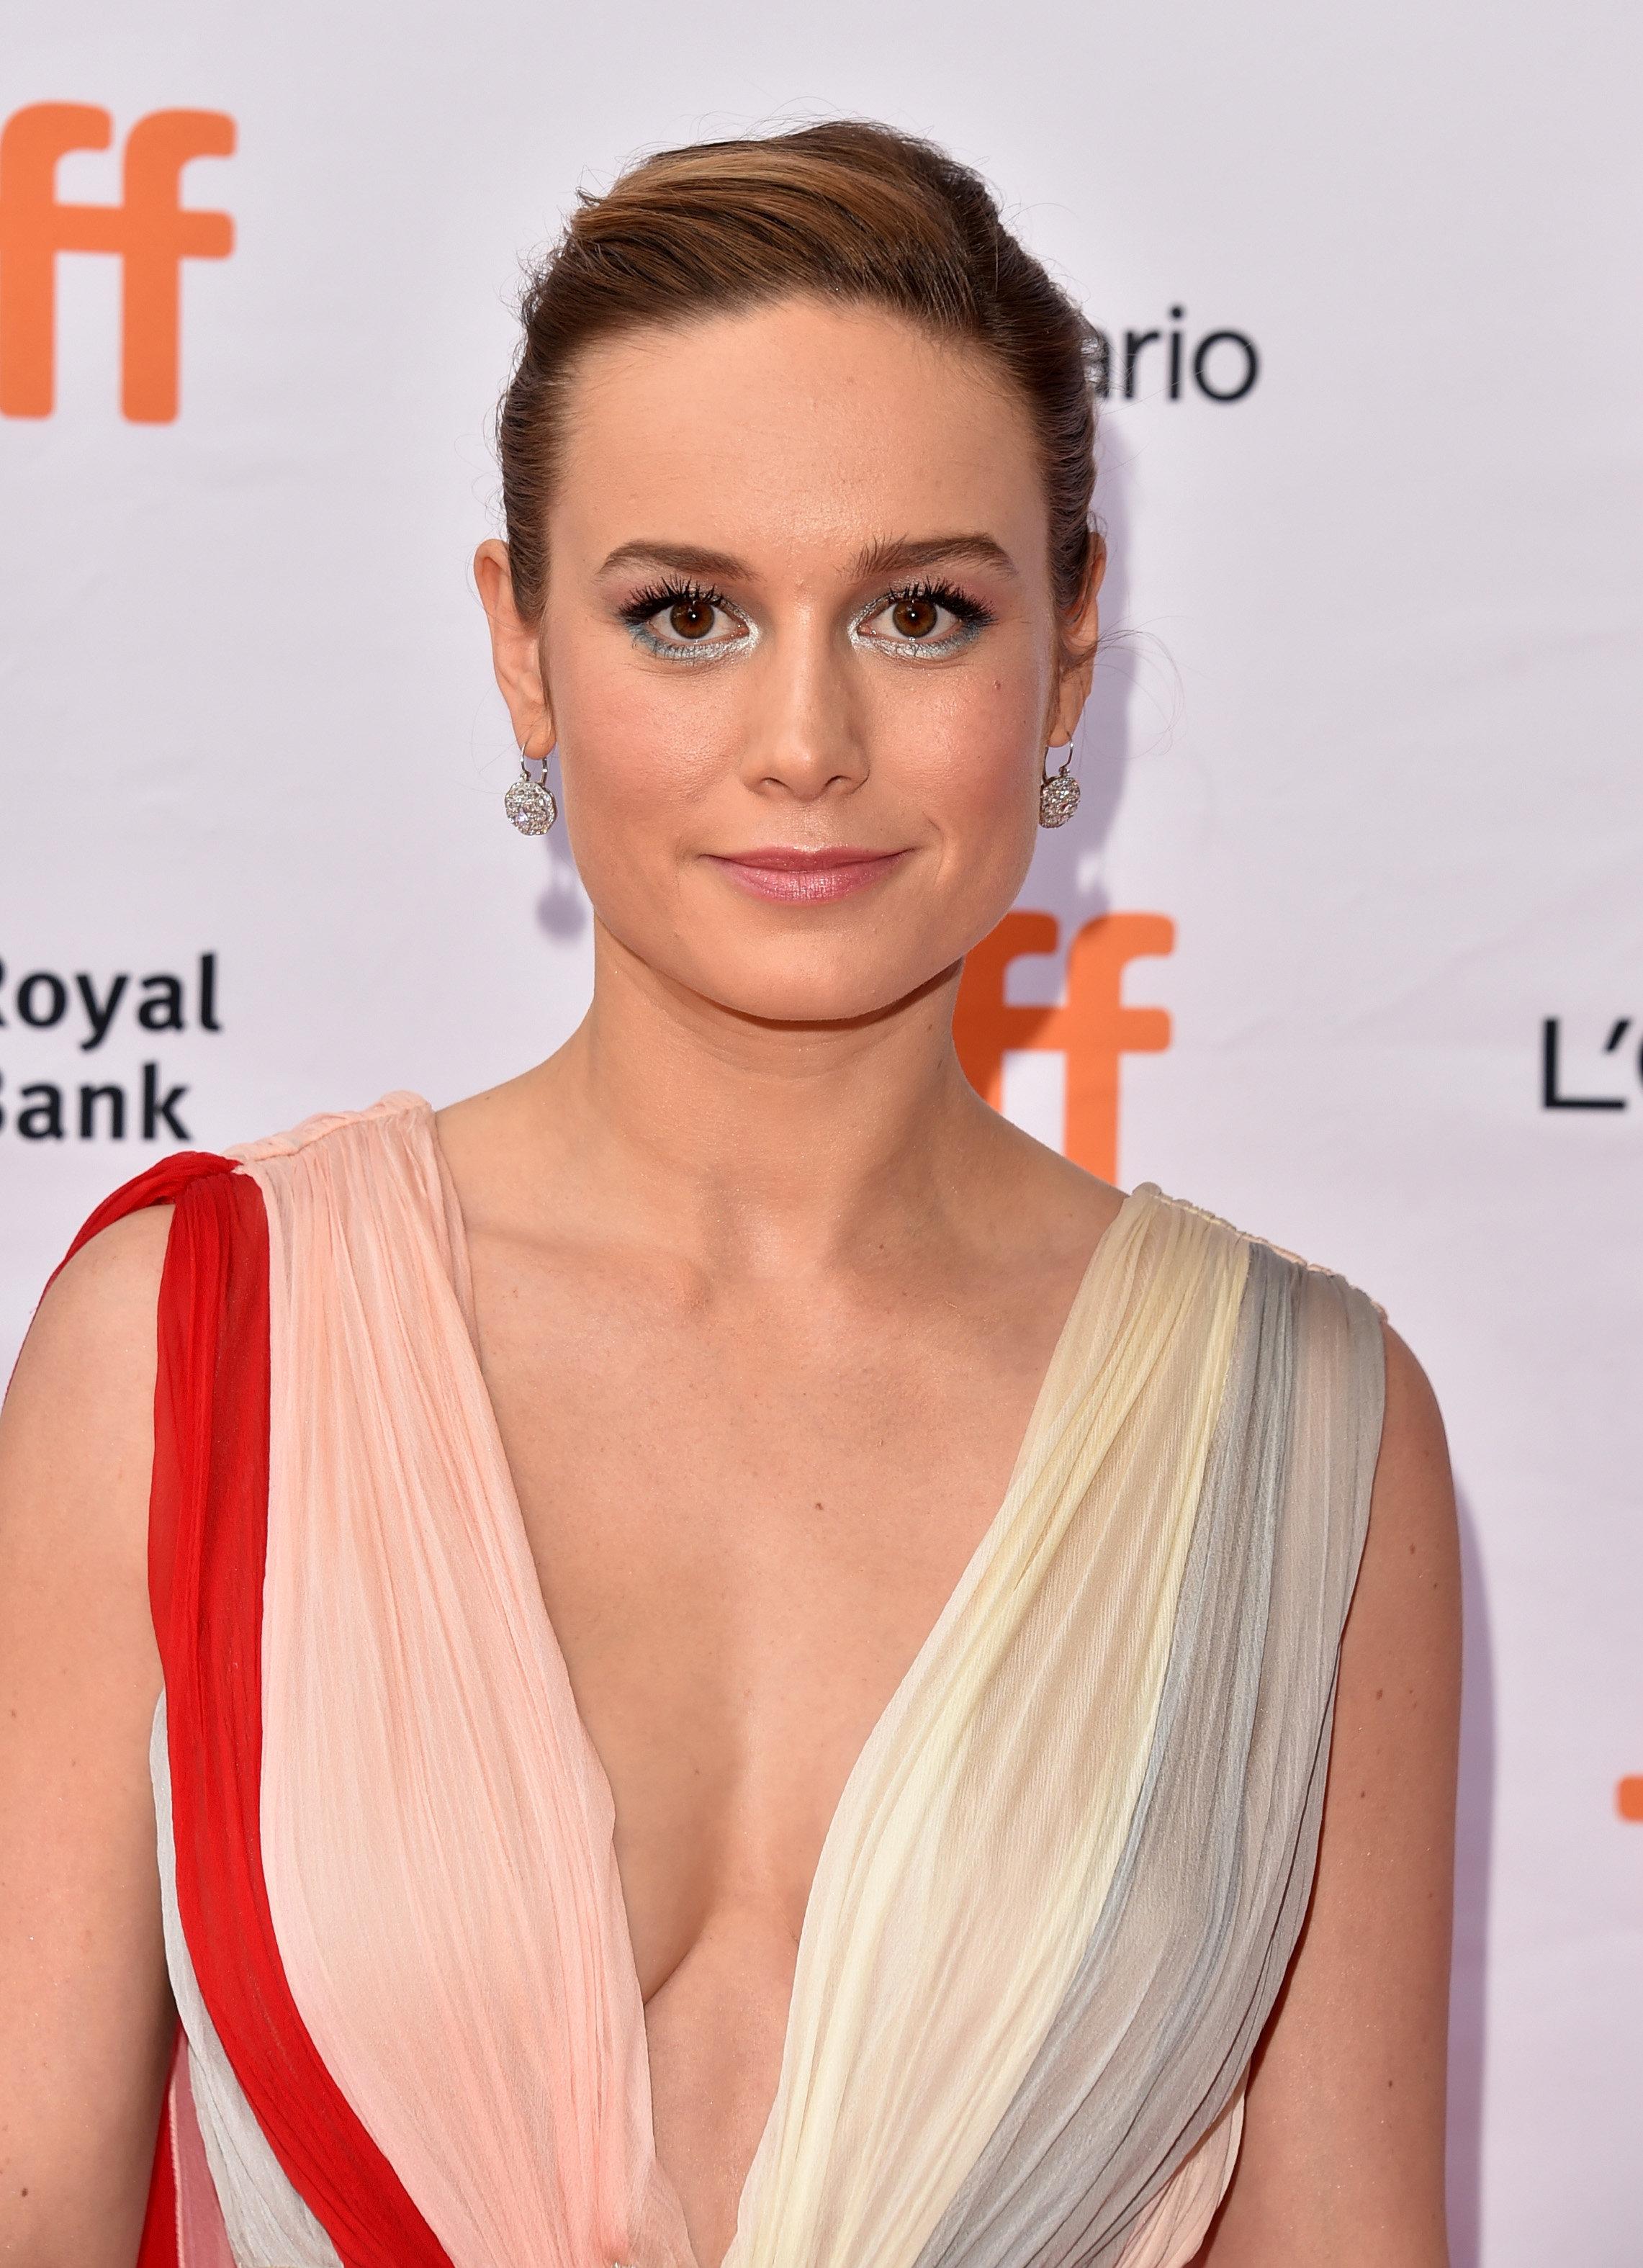 Indian Social Media Users Blast Brie Larson's Awkward 'Basmati Blues'